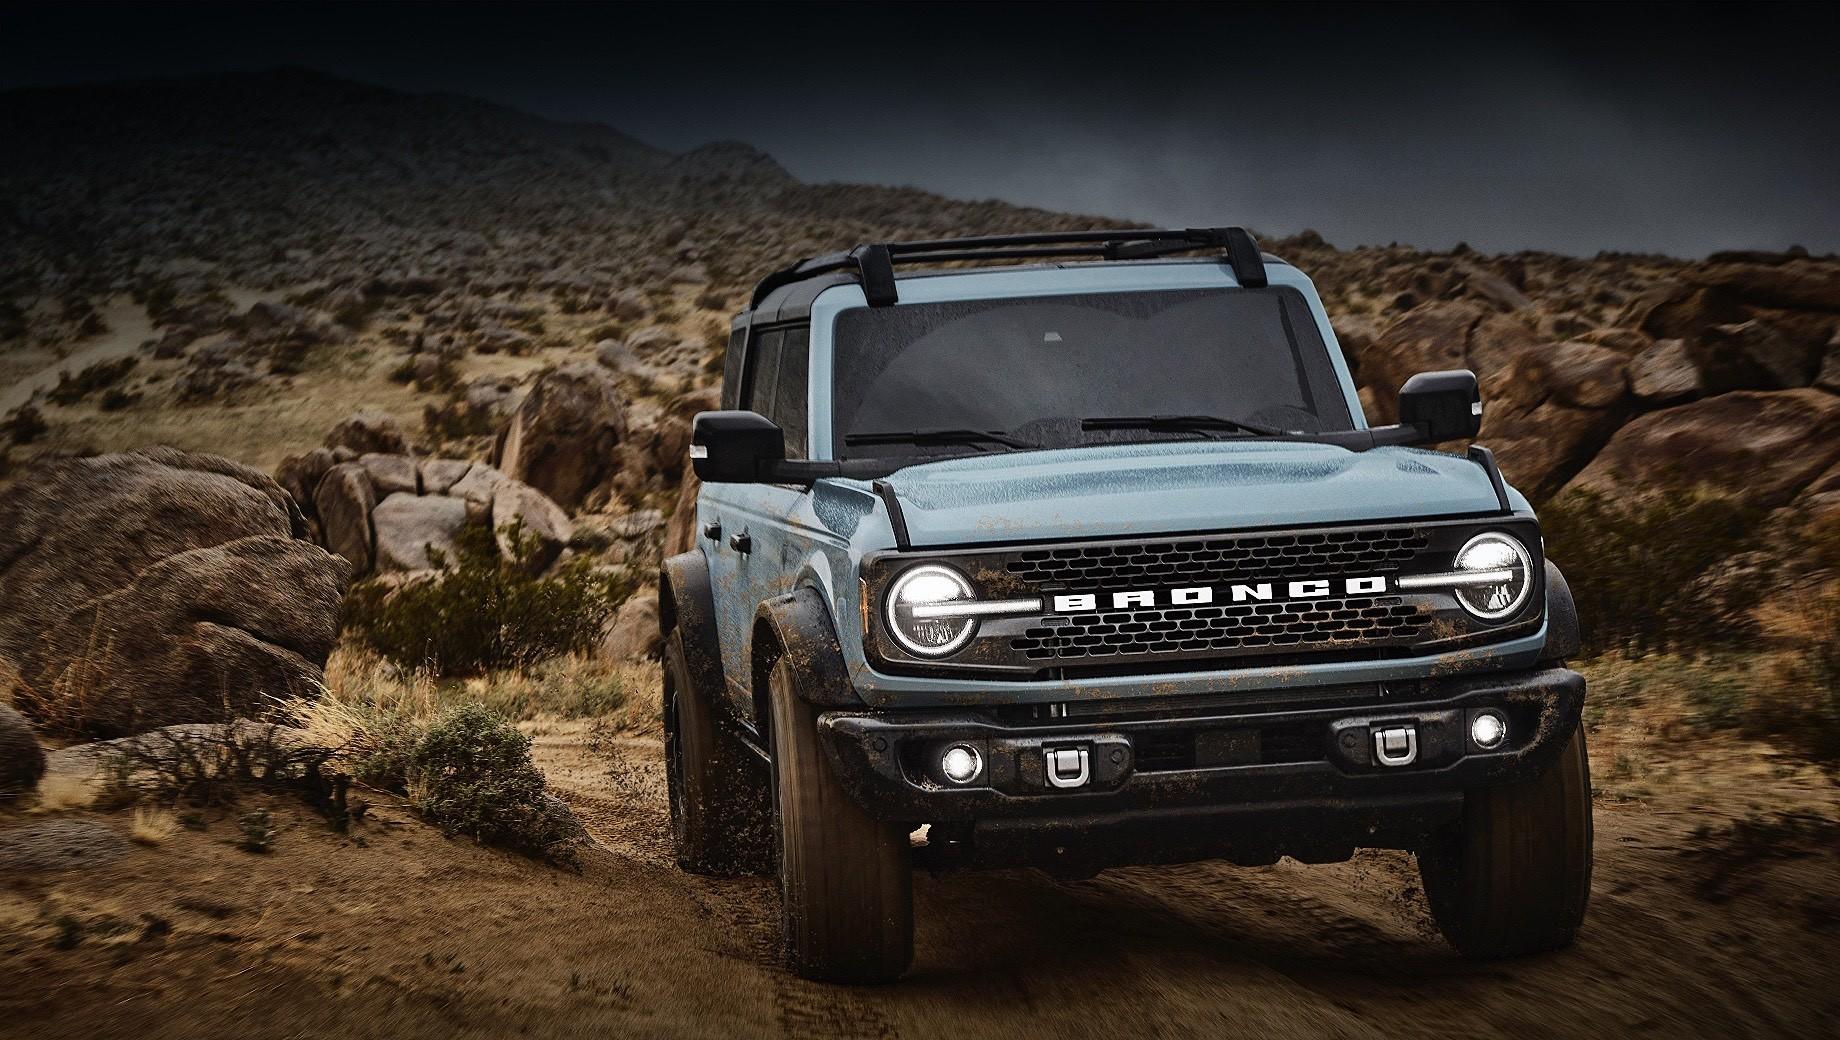 Экостандарты лишили Ford Bronco атмосферного V8